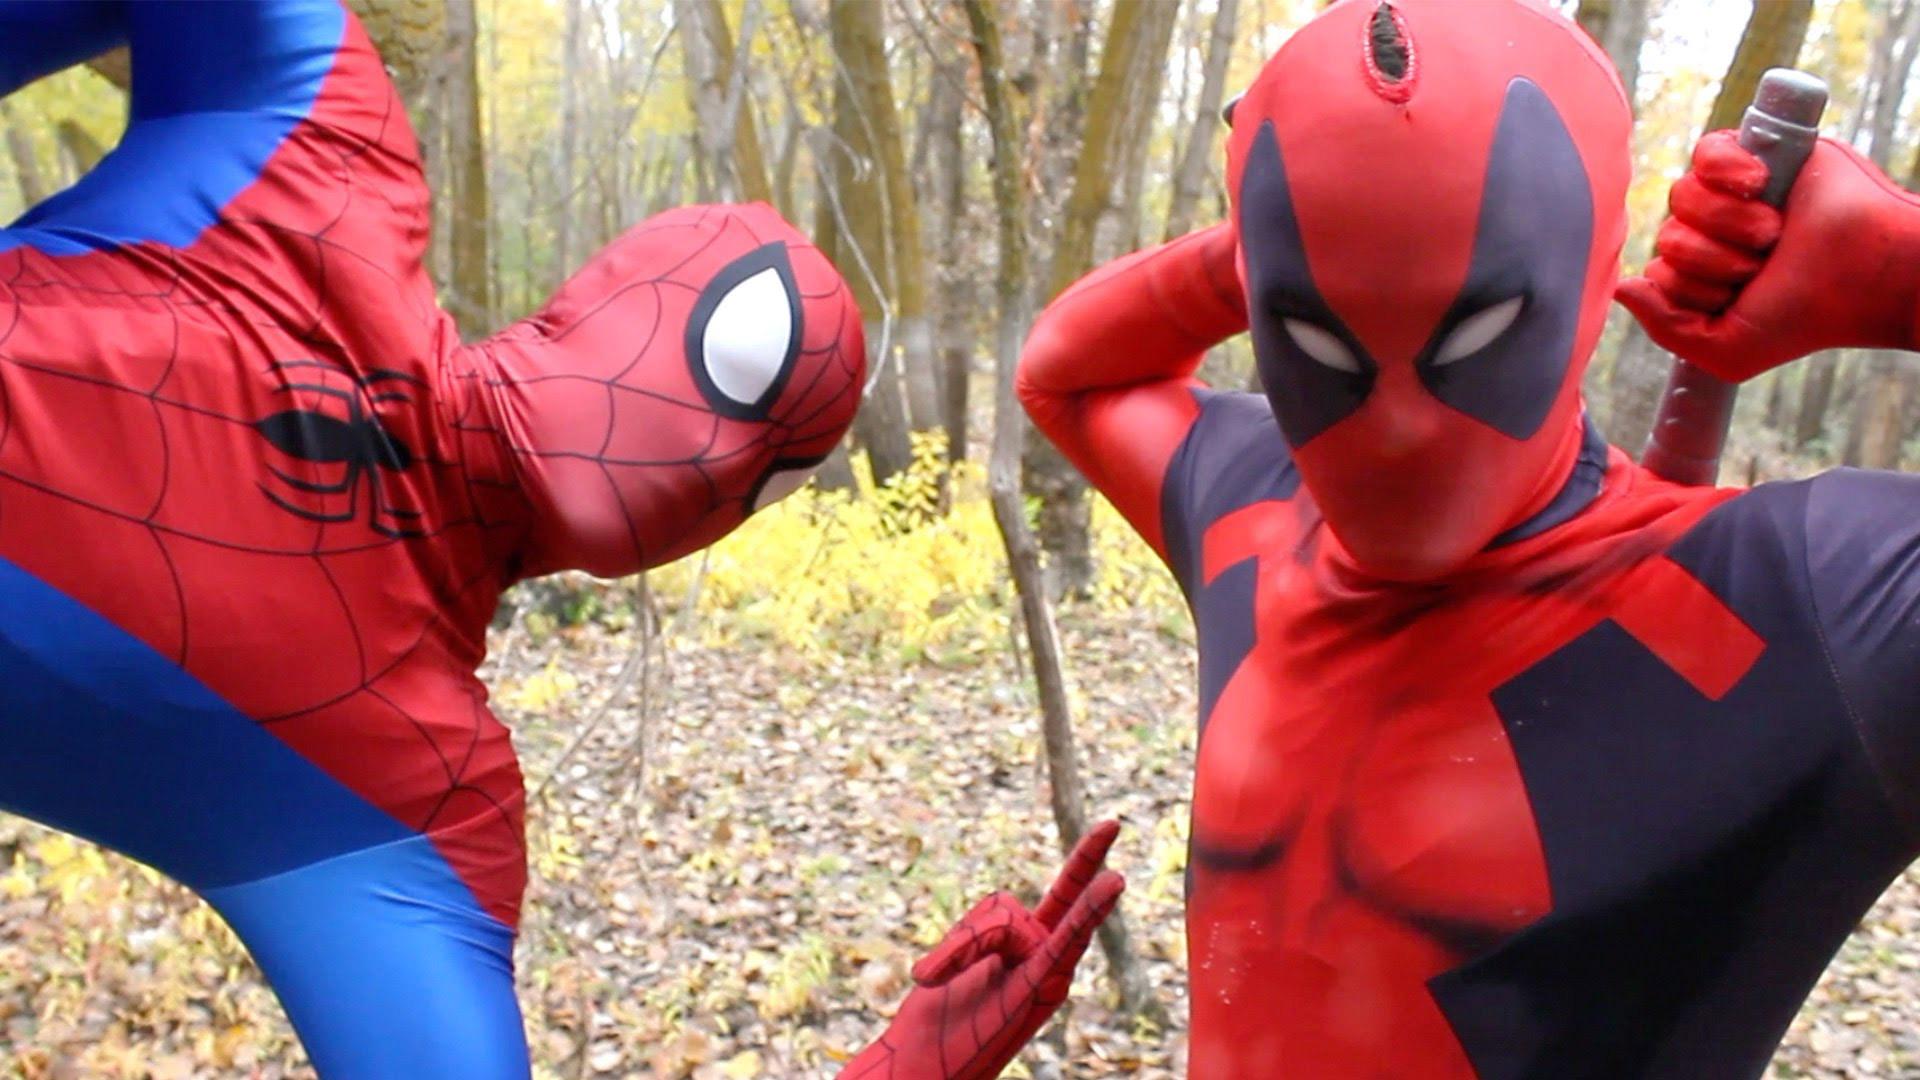 Watch Superheroes In Real Life Sliding Down The Stairs Spiderman Vs Venom Vs Joker Prime Video